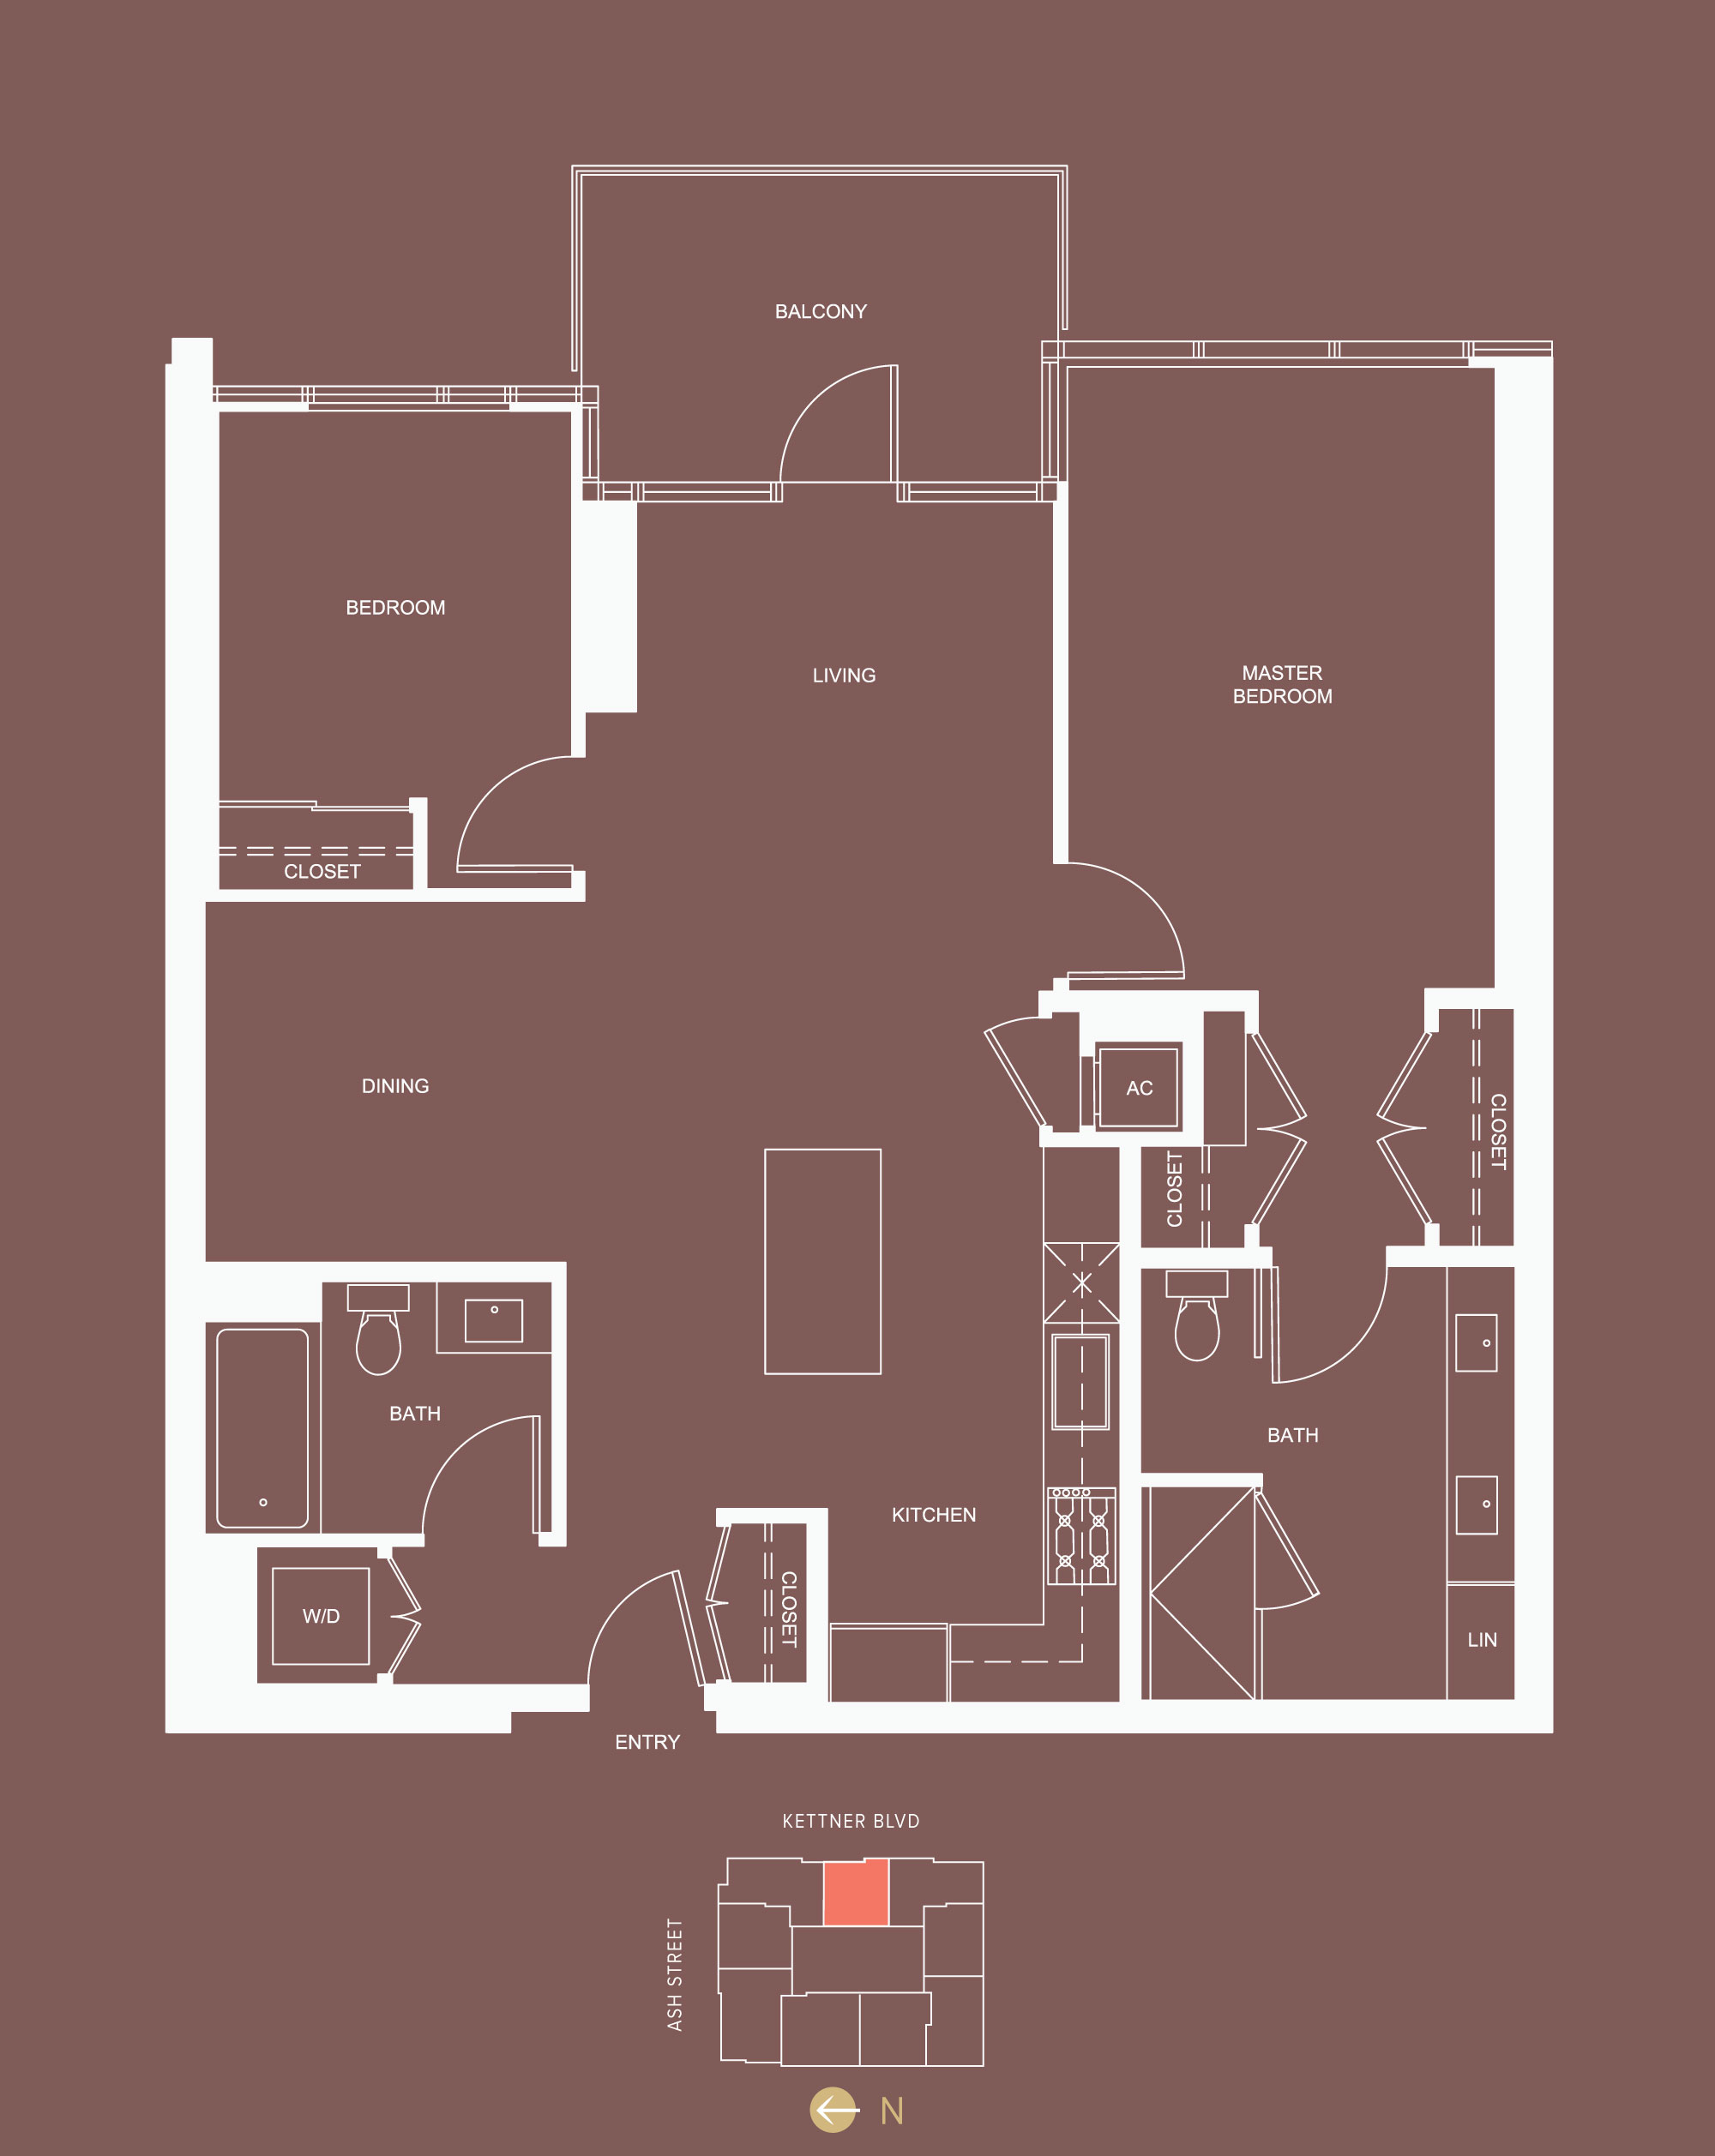 2 bed / 2 bath - approx 1,170 sf - floor 9-24, 25-27